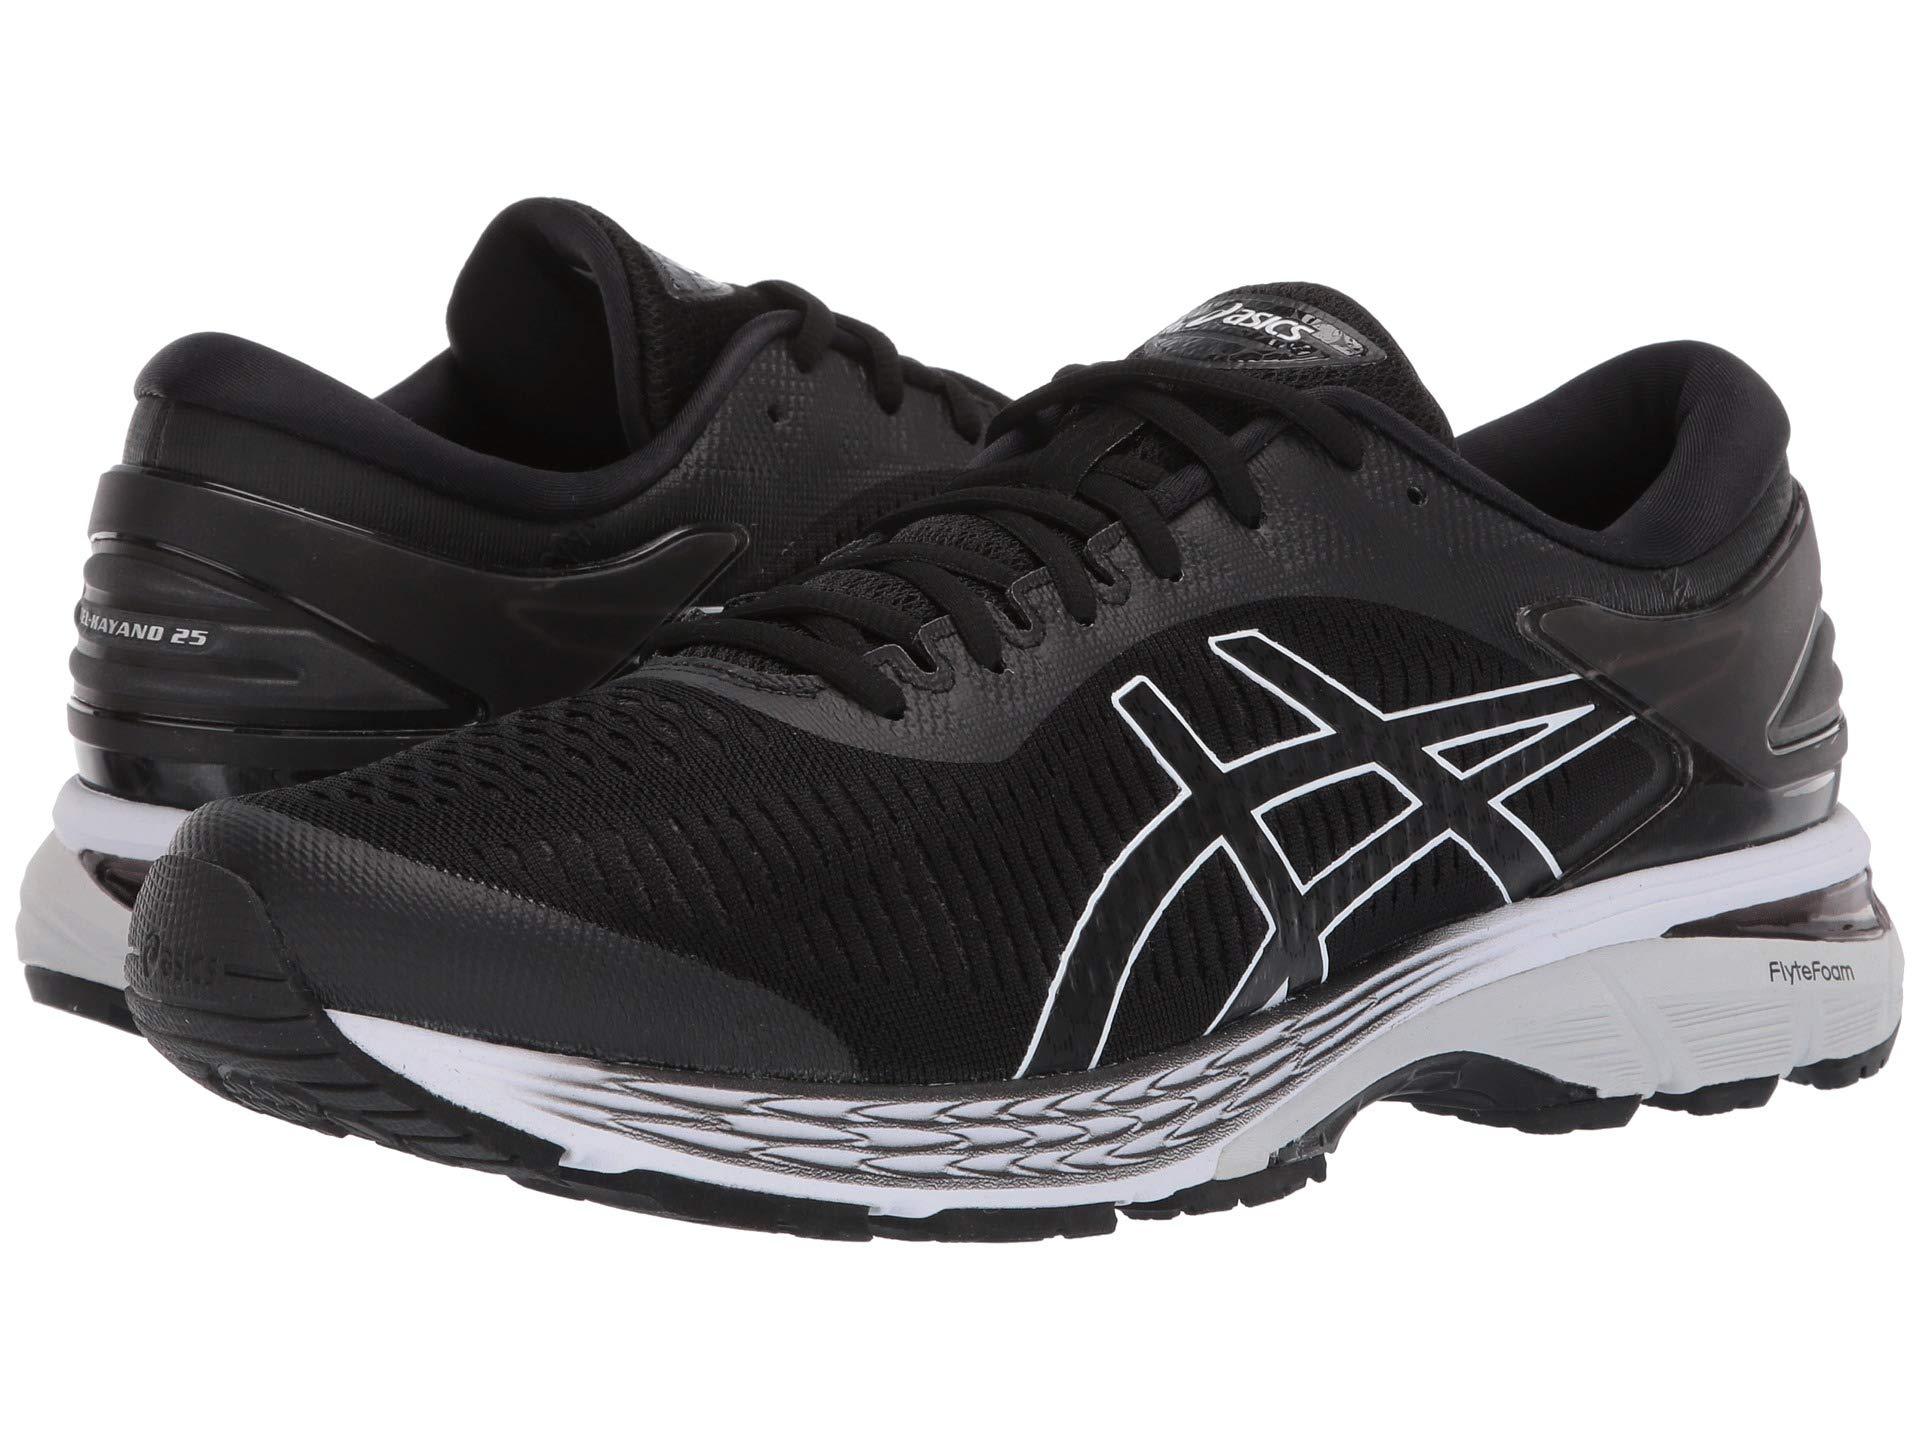 ASICS Gel Kayano 25 Men's Running Shoe, Black/Glacier Grey, 6.5 D US by ASICS (Image #7)